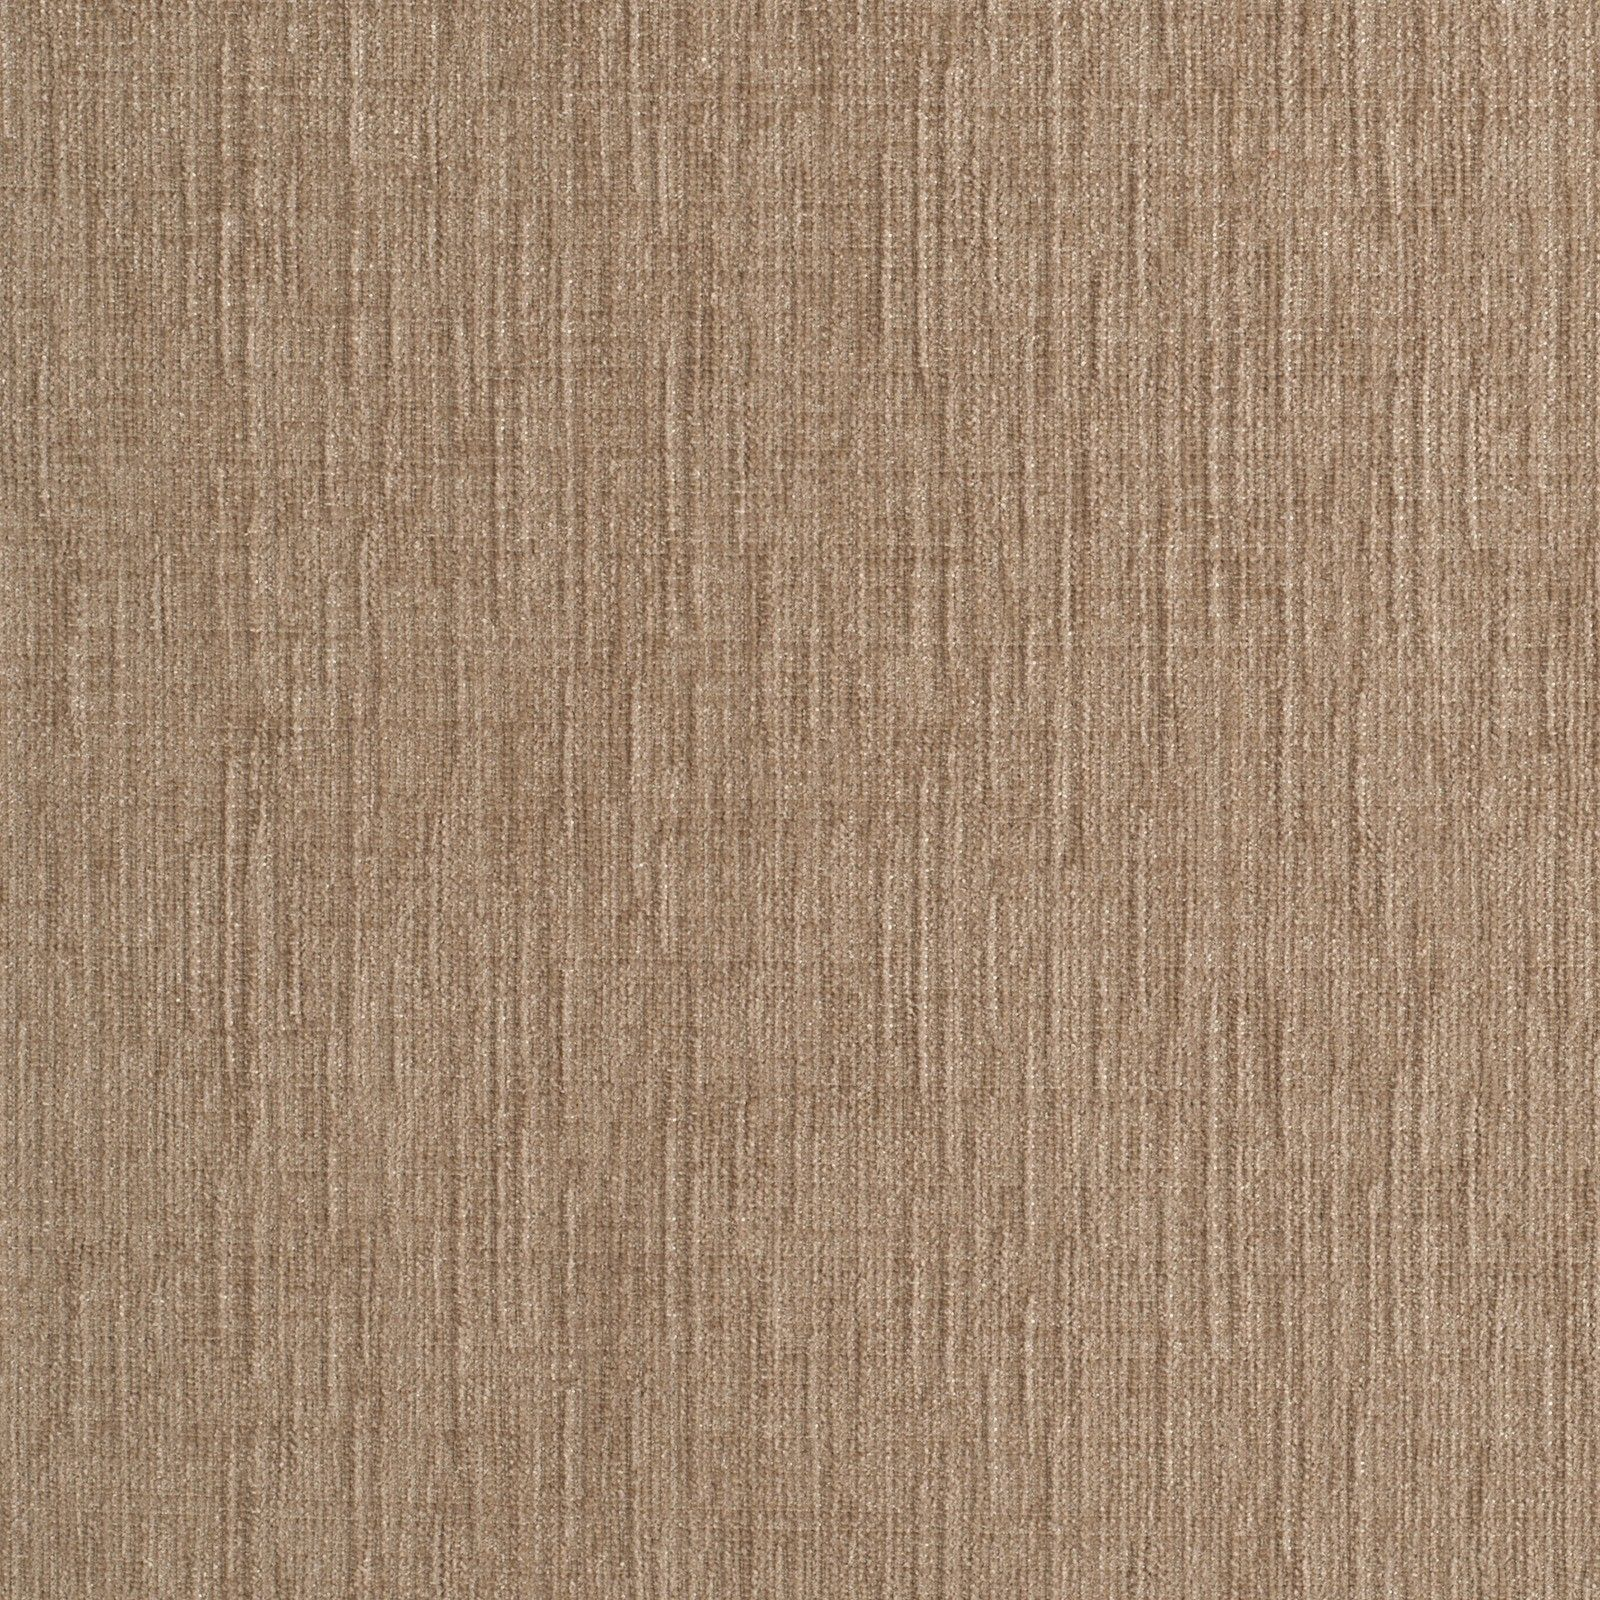 ANICHINI Fabrics | Custom Linen Velvet Sage Contract Fabric - a green linen velvet fabric